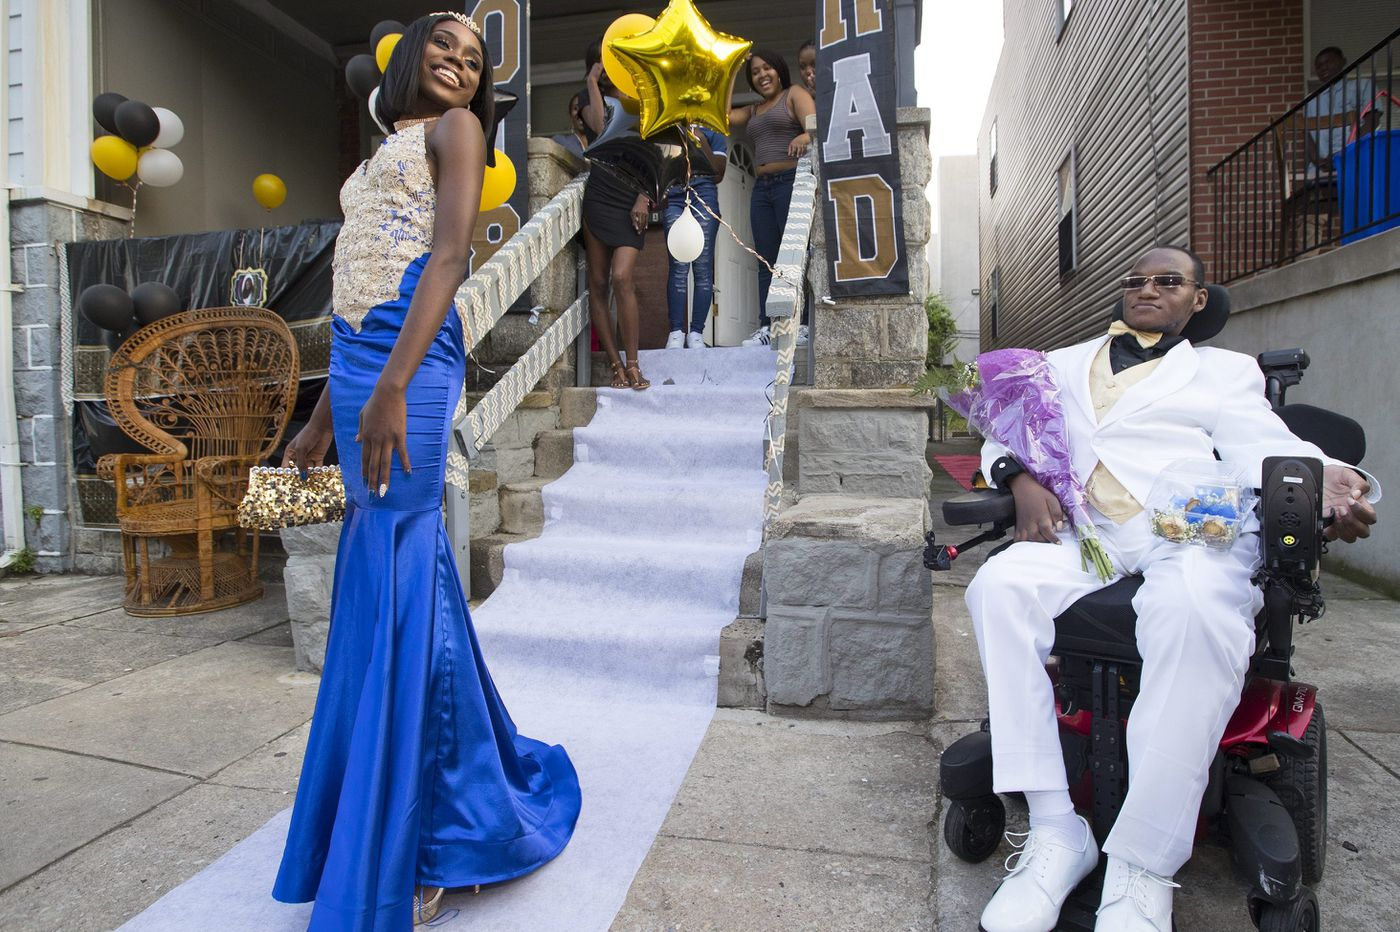 Gunshot victim goes to prom, with the help of Magee Rehab | Helen Ubiñas